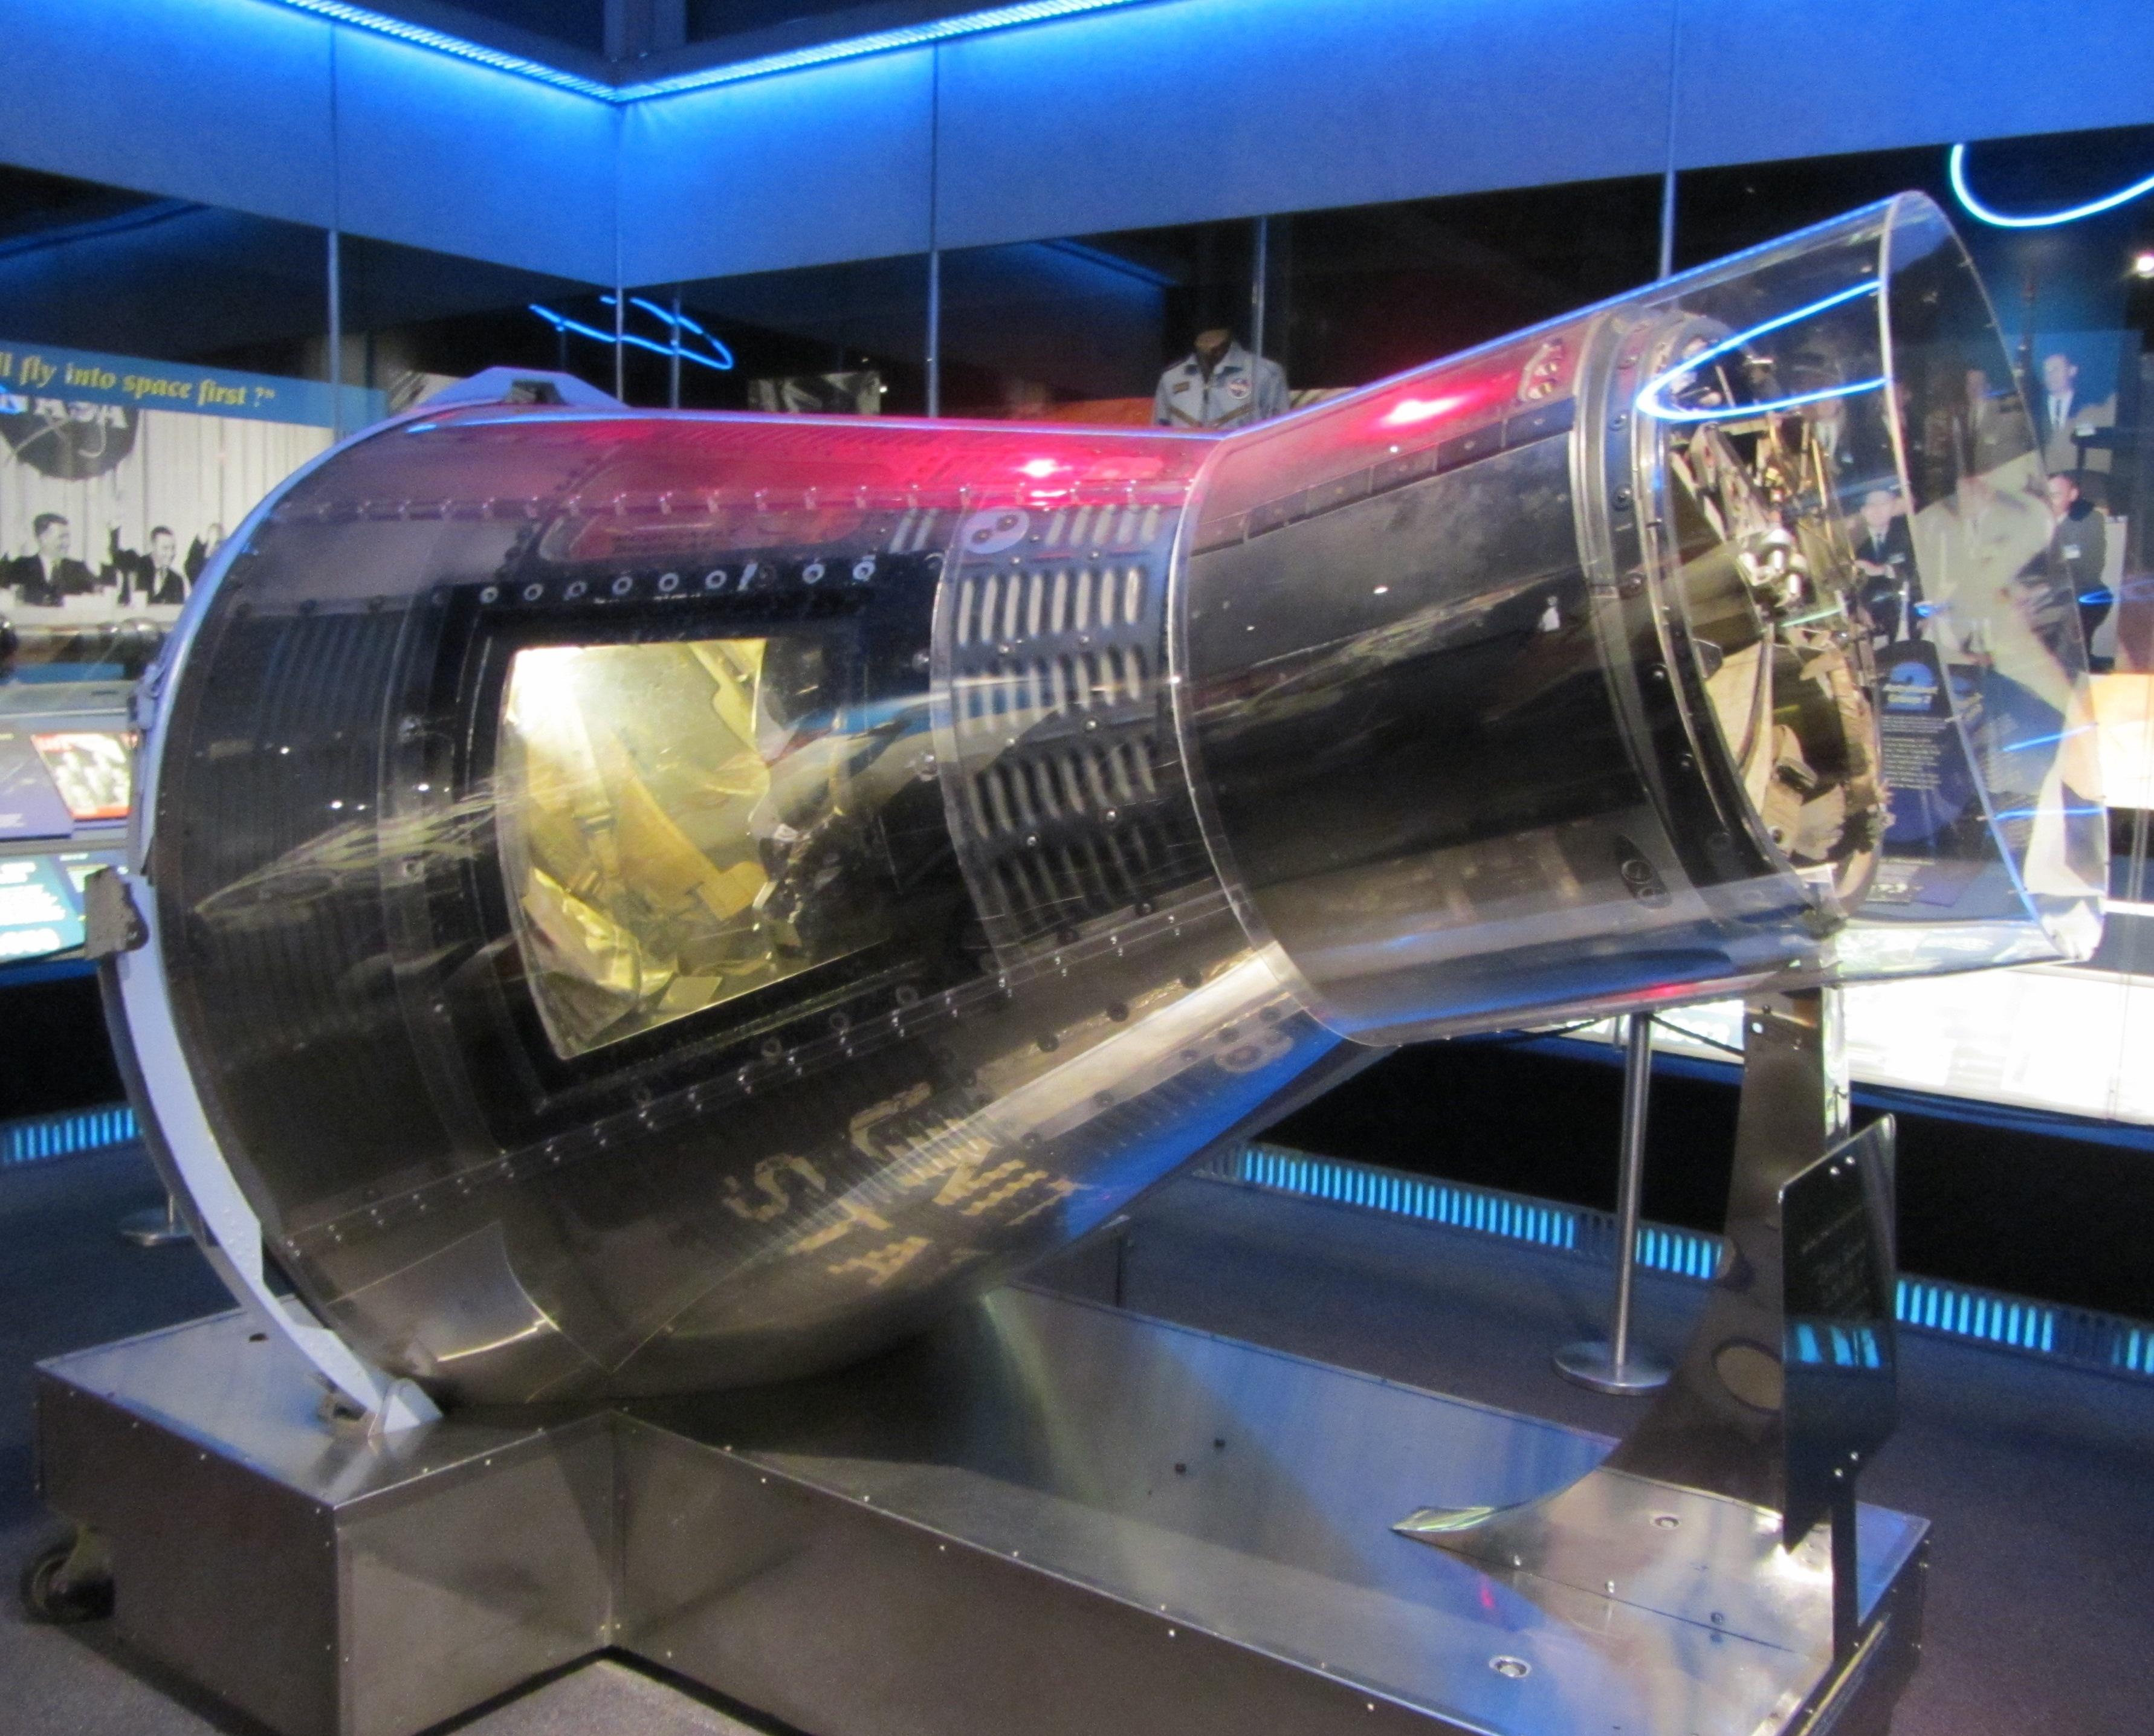 MA-8_Sigma_7_Astronaut_Hall_of_Fame,_Titusville,_FL